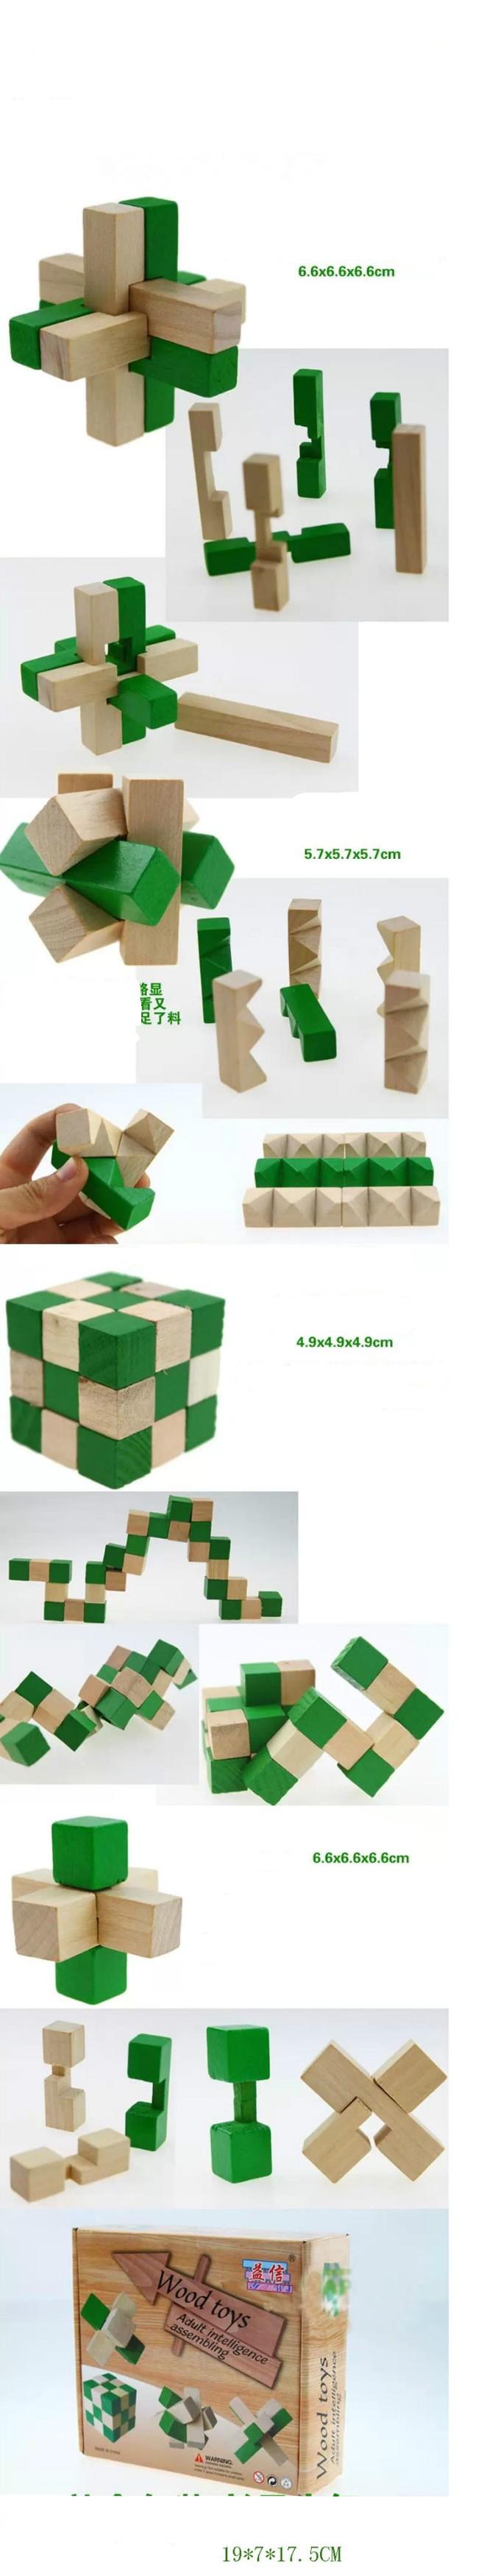 WOODEN PUZZLES - 4 Pcs IQ 3D Wooden Interlocking Burr Puzzles